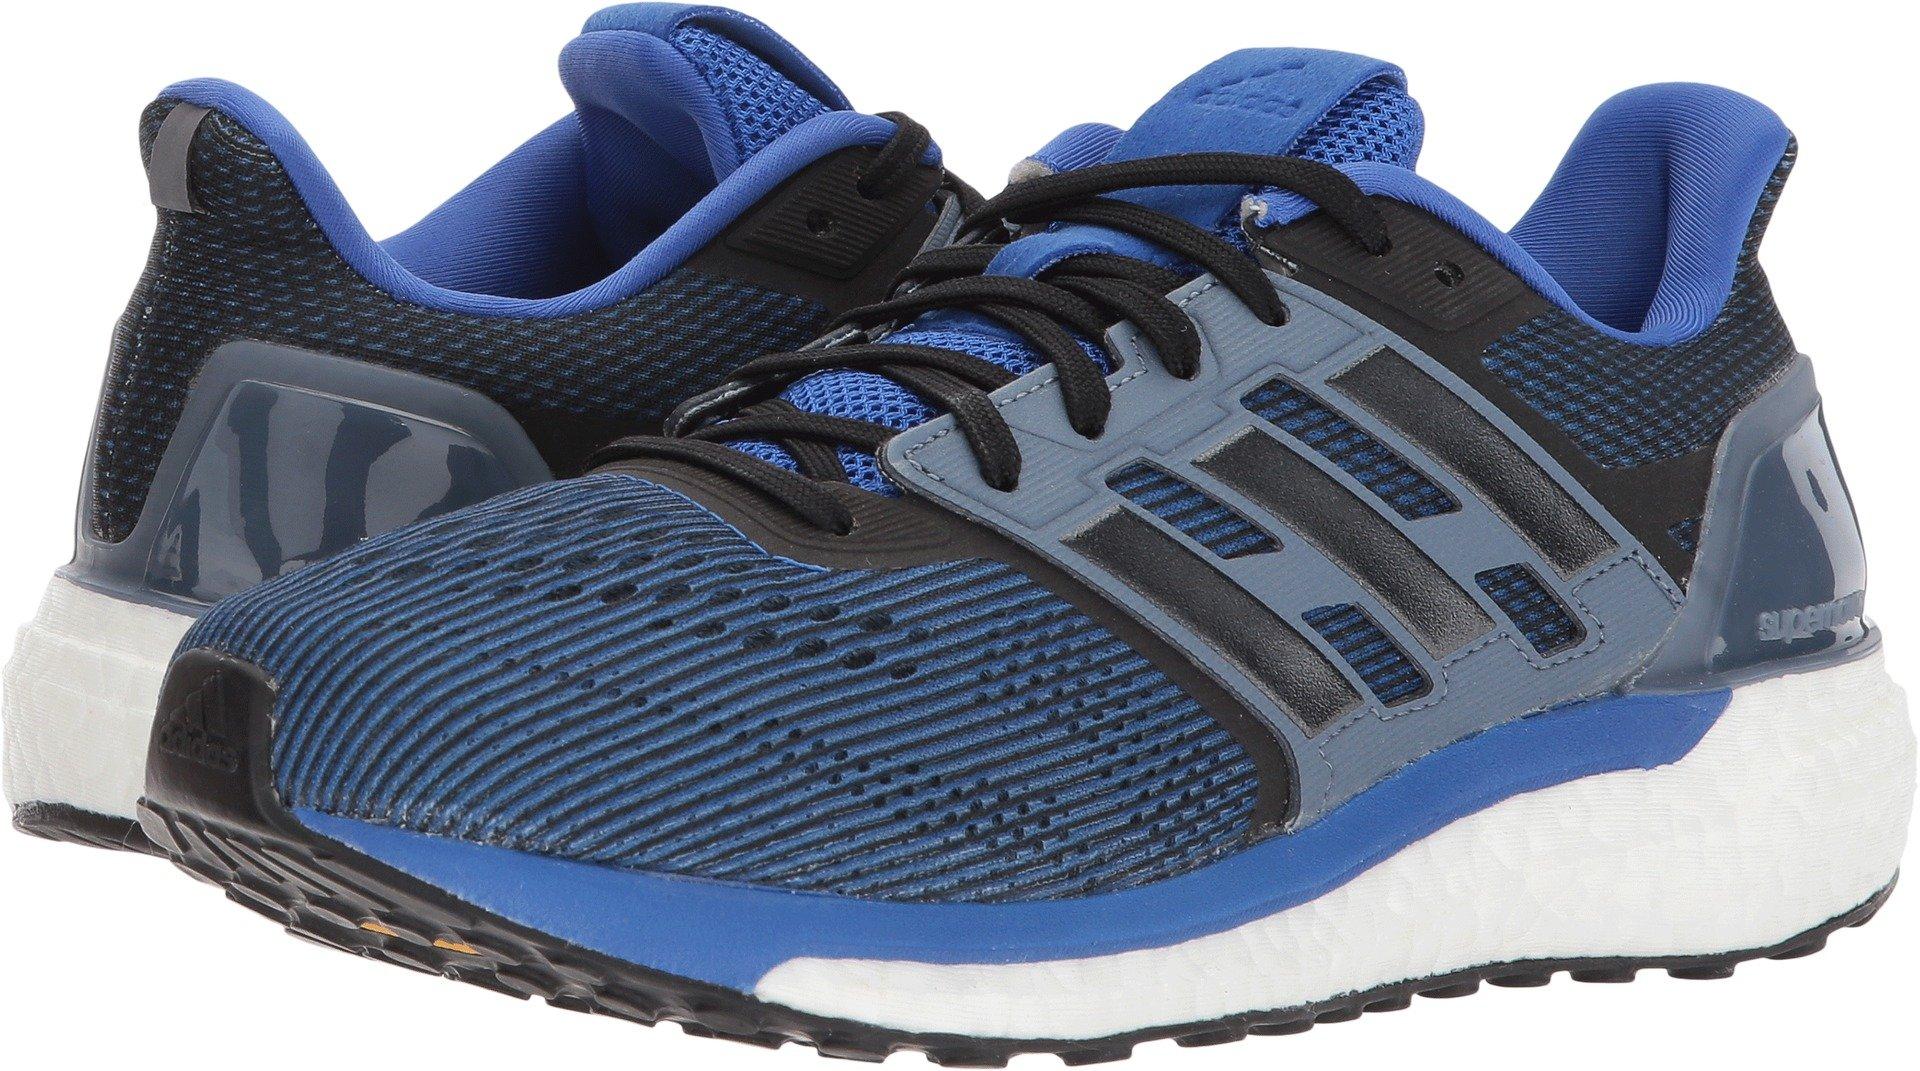 Galleon - Adidas Men s Supernova M Running Shoe f254a439e